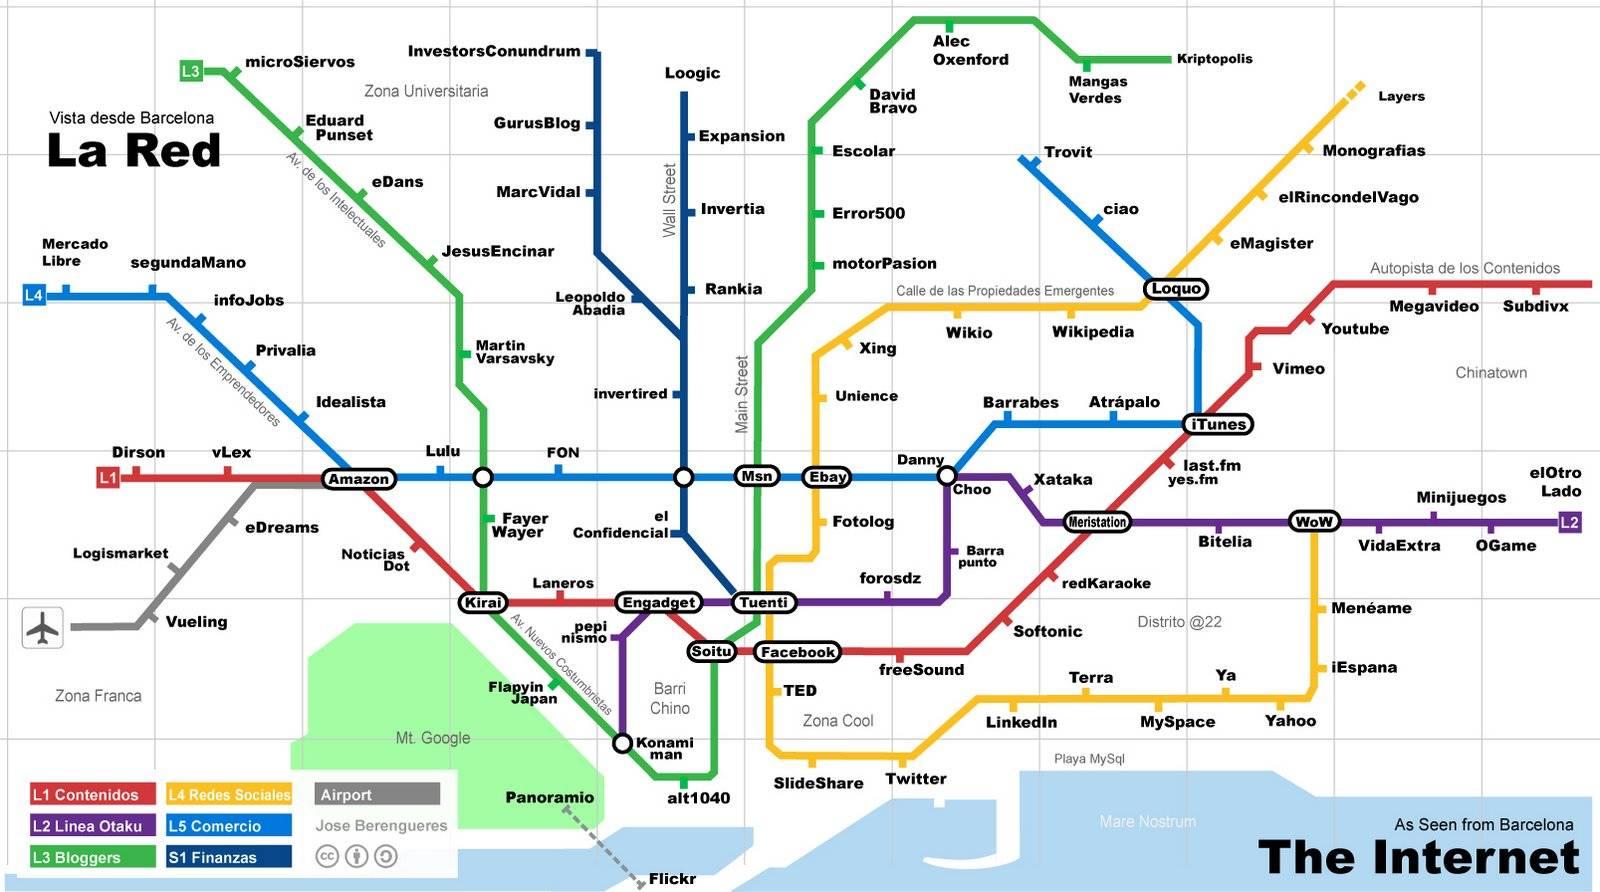 Общественный транспорт барселоны 2021: метро, автобусы, трамваи, электрички, аренда авто, такси